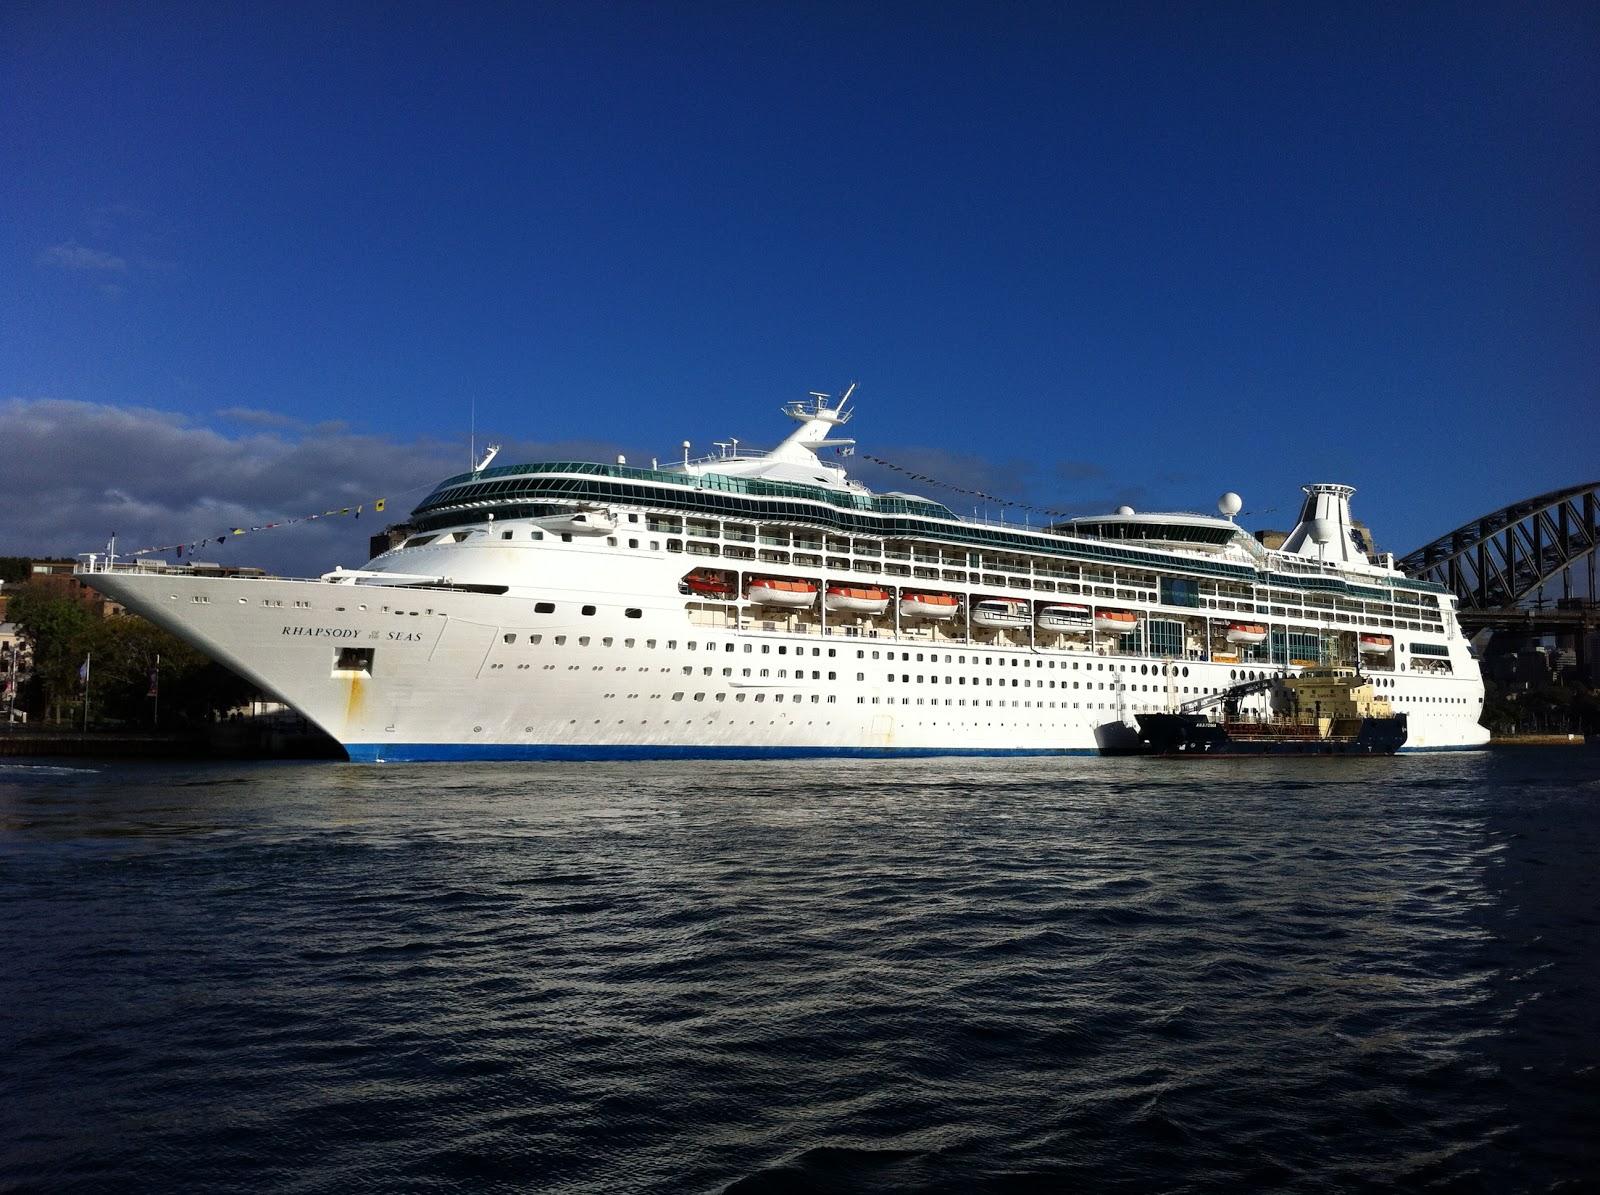 sydney ships - photo#32